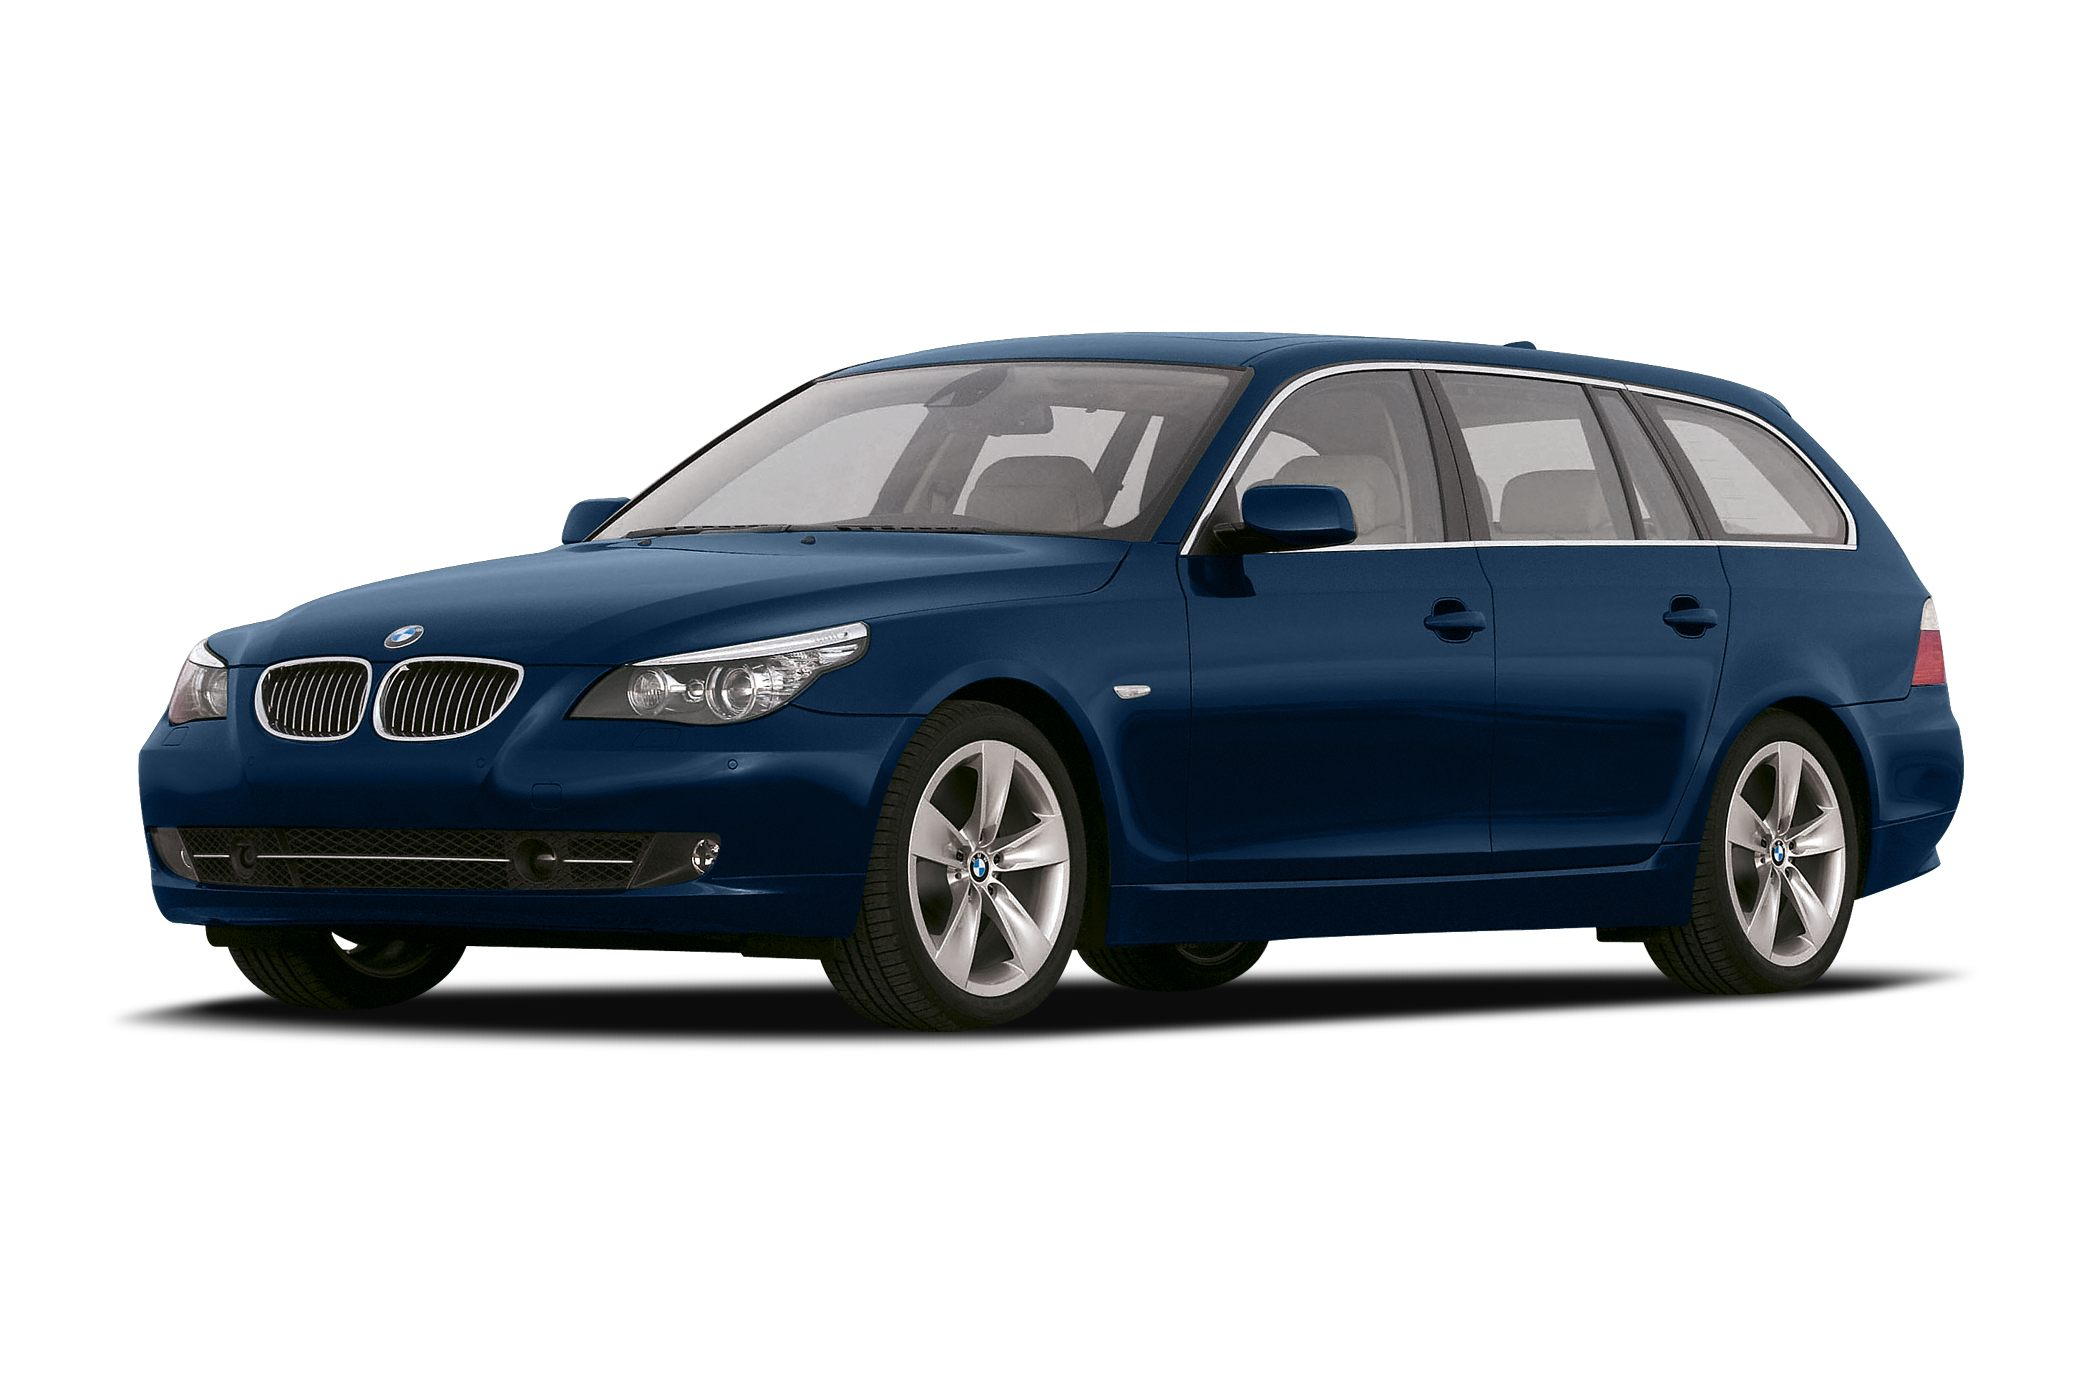 2010 BMW 535